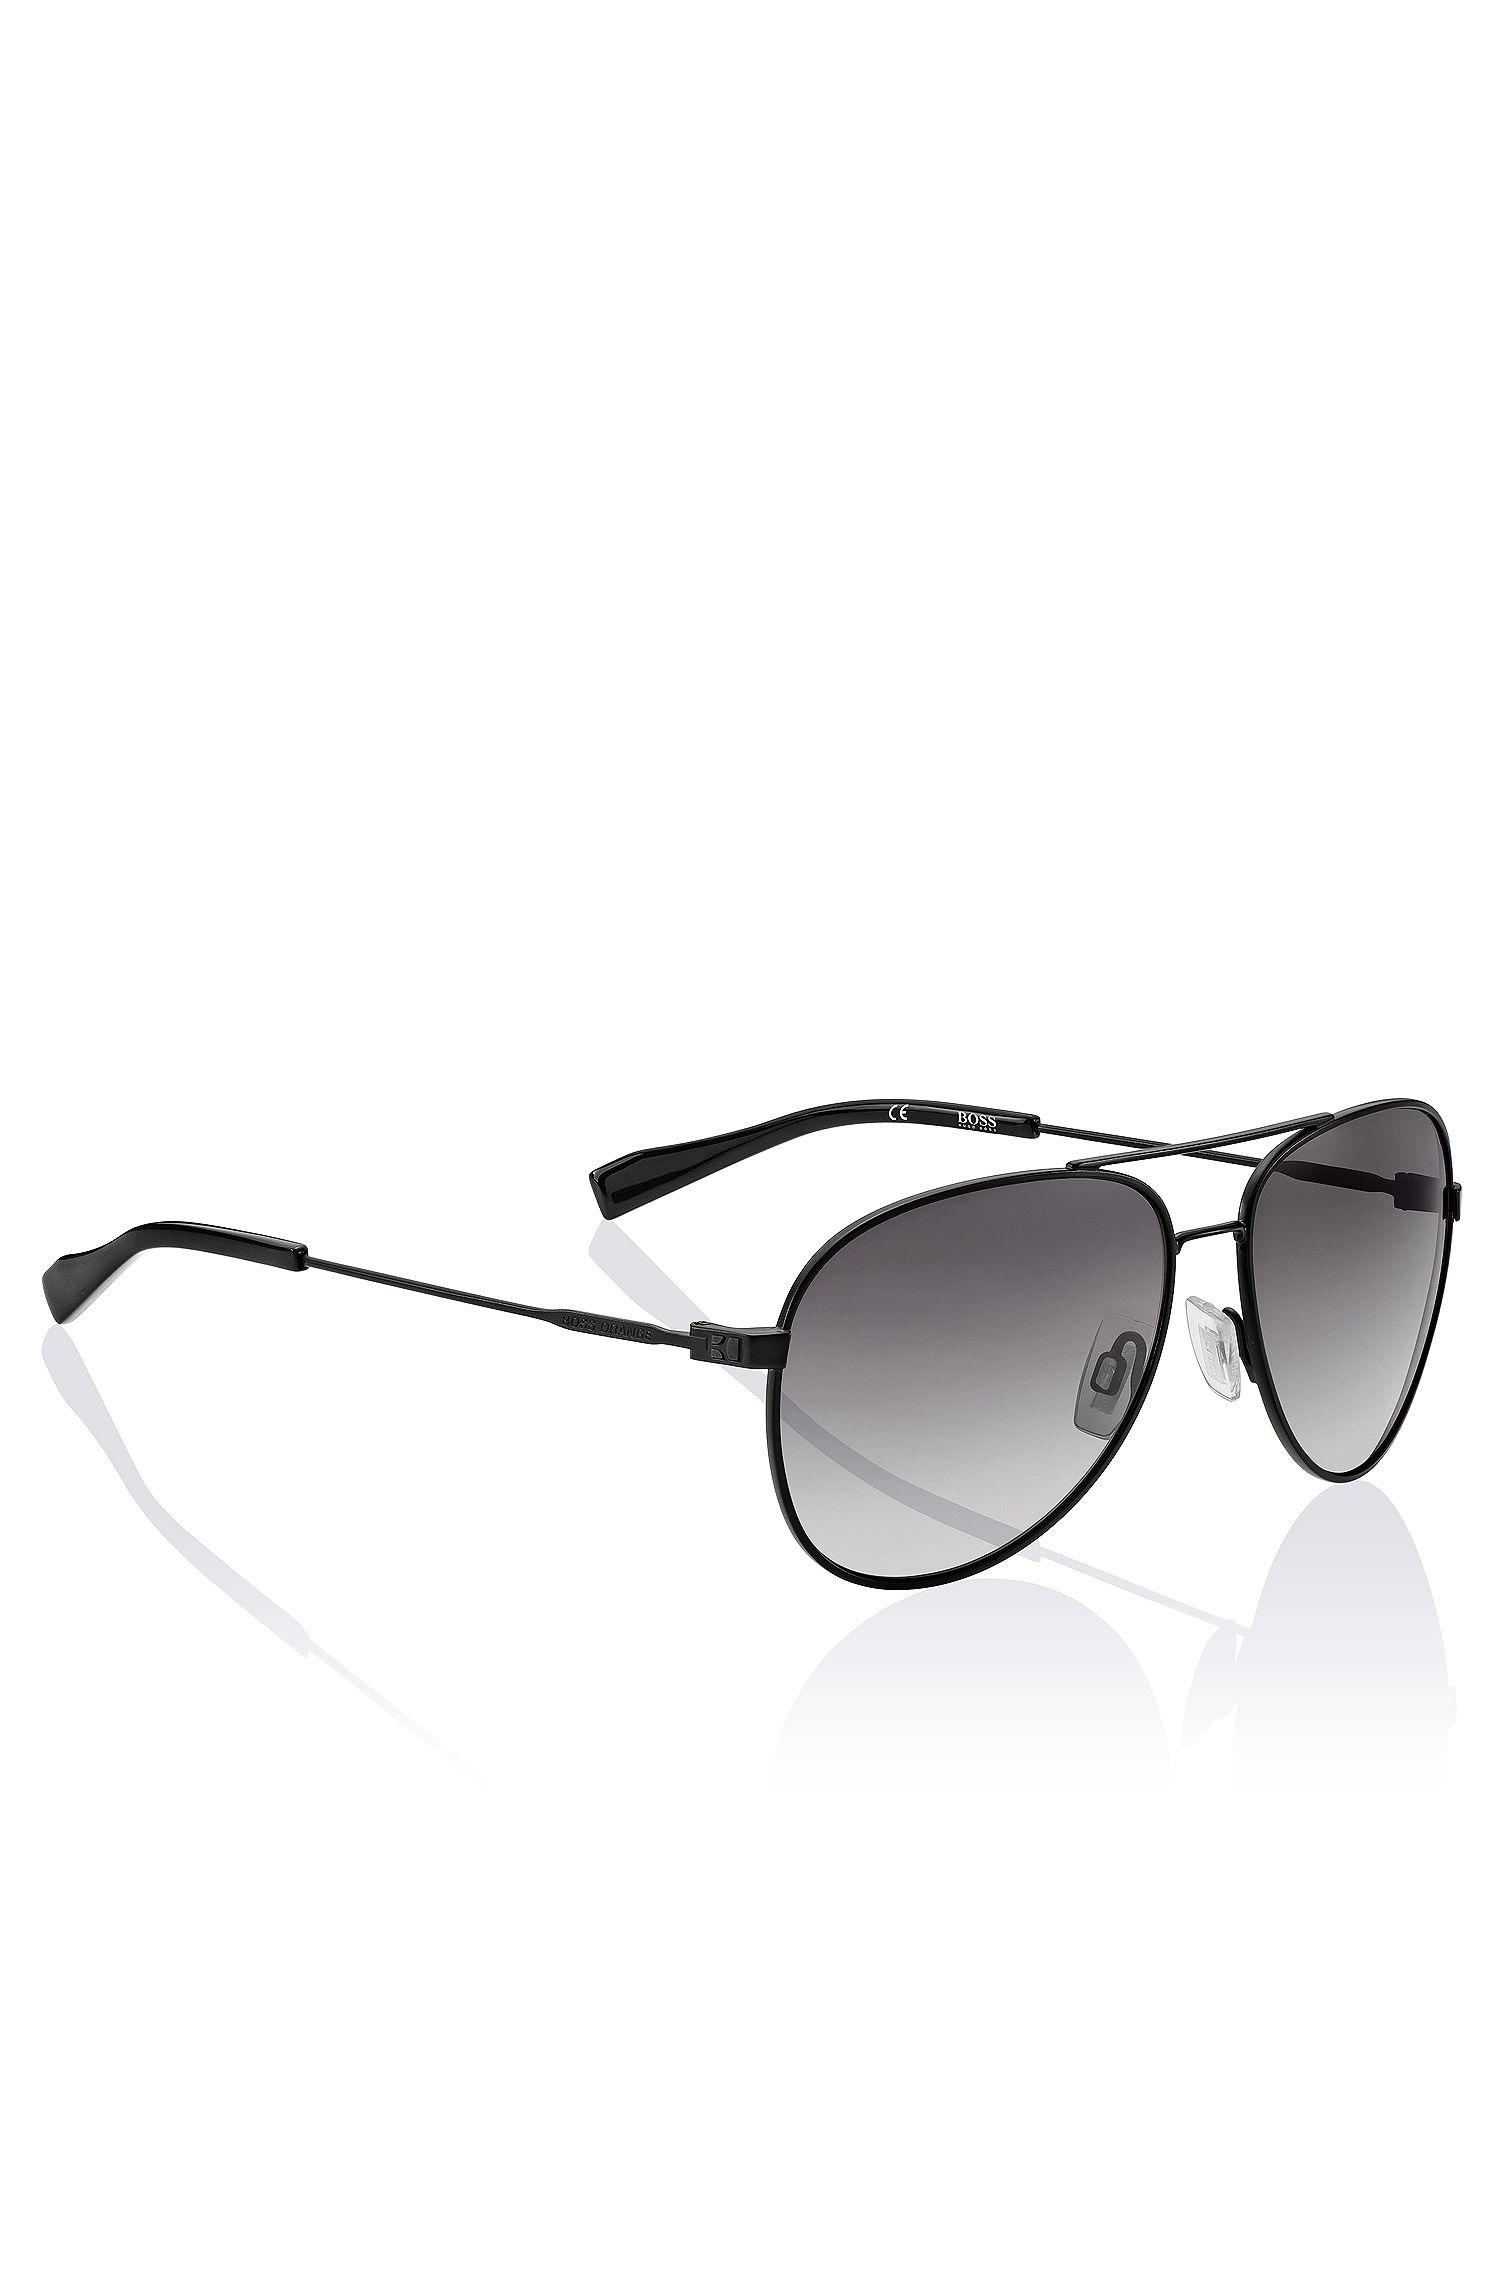 Sunglasses 'BO 0157/S'